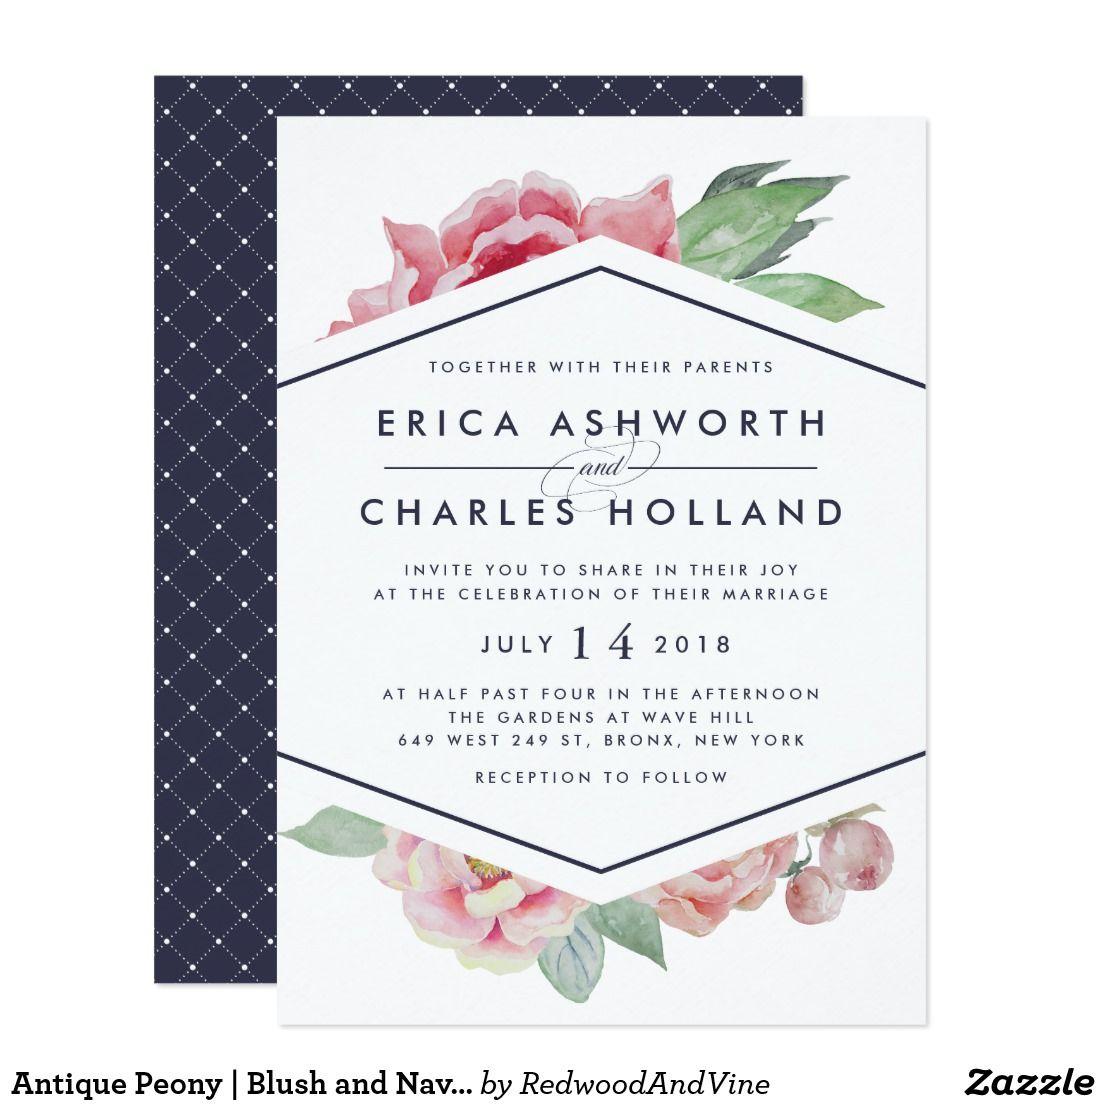 Antique Peony | Blush and Navy Wedding Invitation | Navy weddings ...